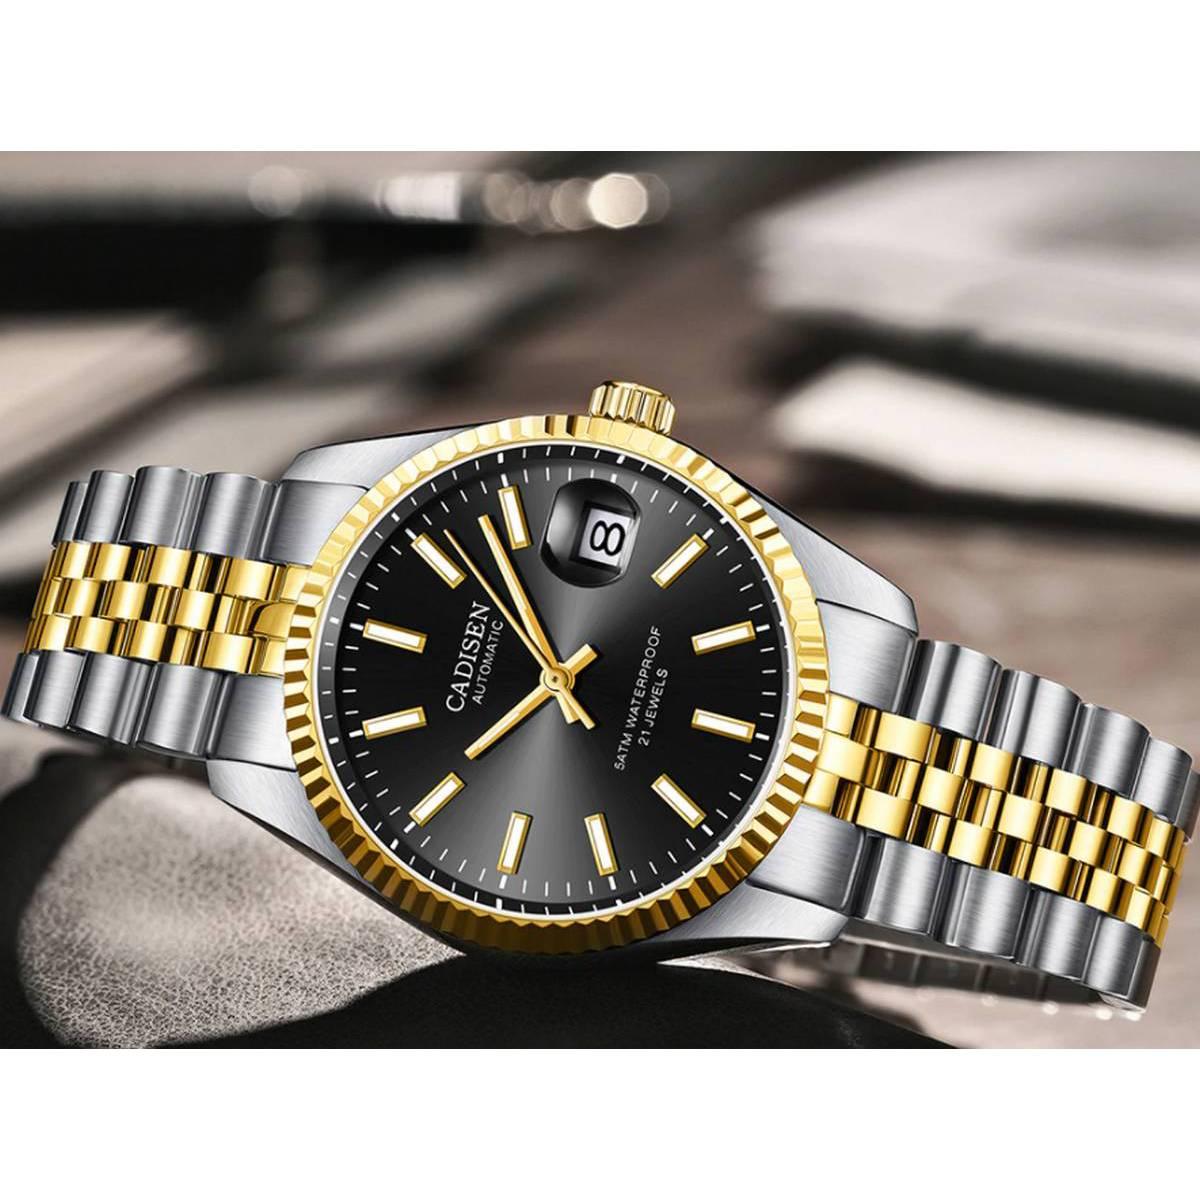 CADISEN Seagull 2813 Movement Men`s Watch Automatic Mechanical Watches 50M Diving Auto date Wrist Watch Men relogio masculino